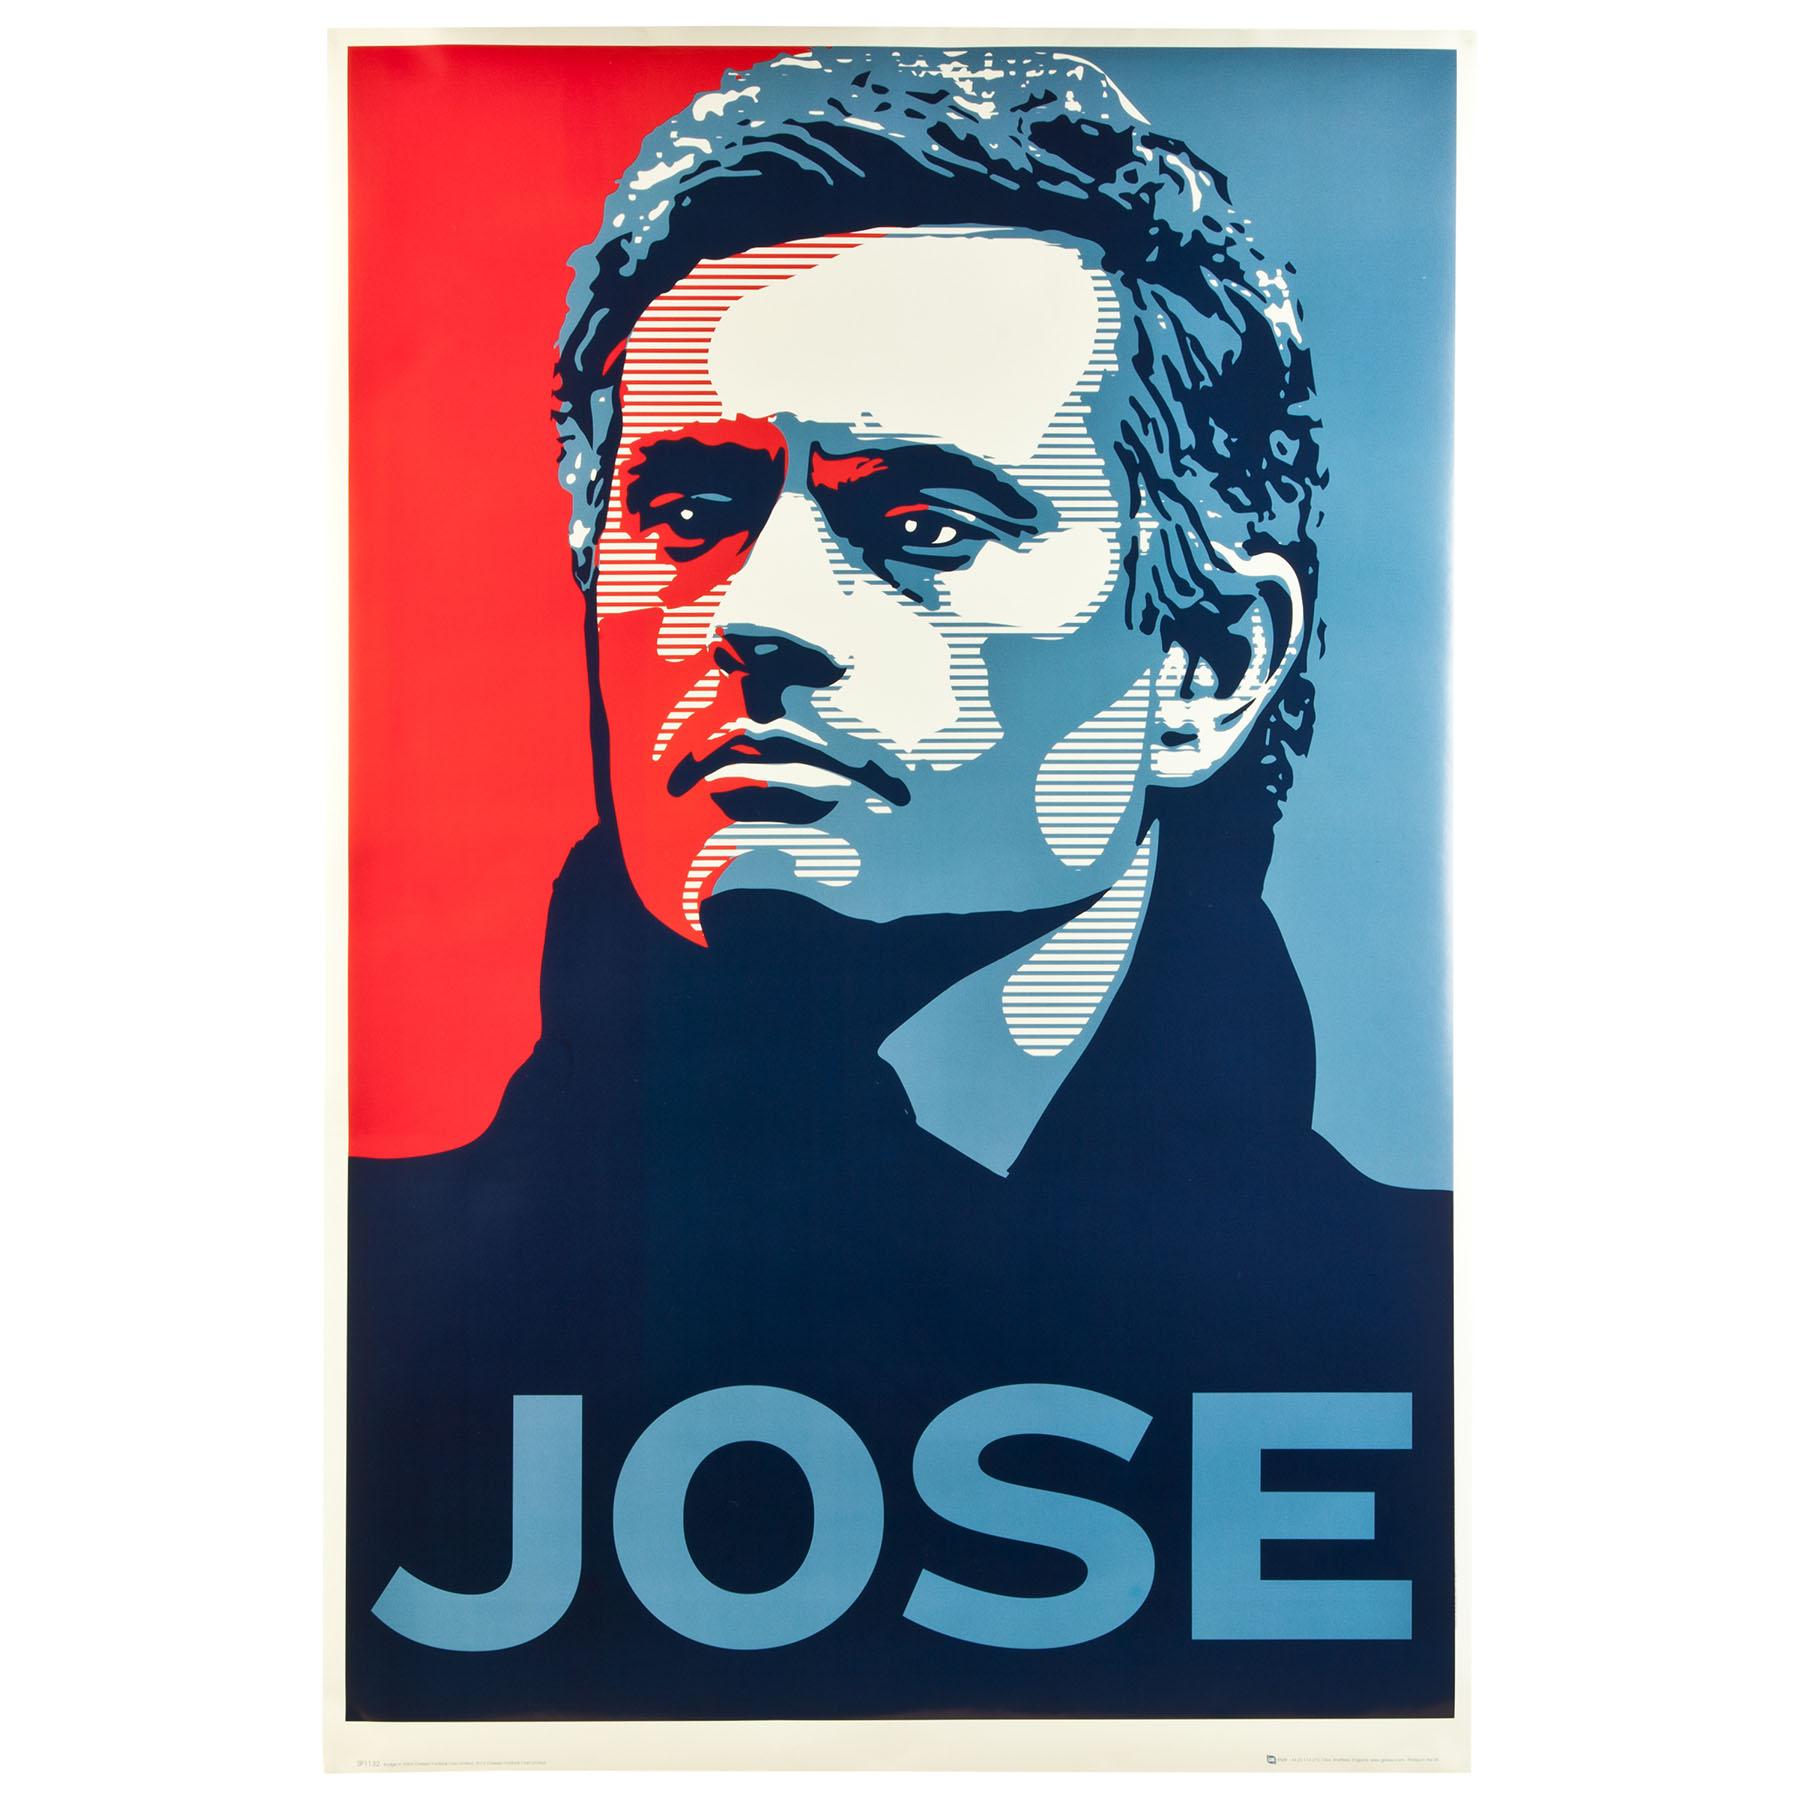 Chelsea Jose Mourinho Poster - 61 x 92cm